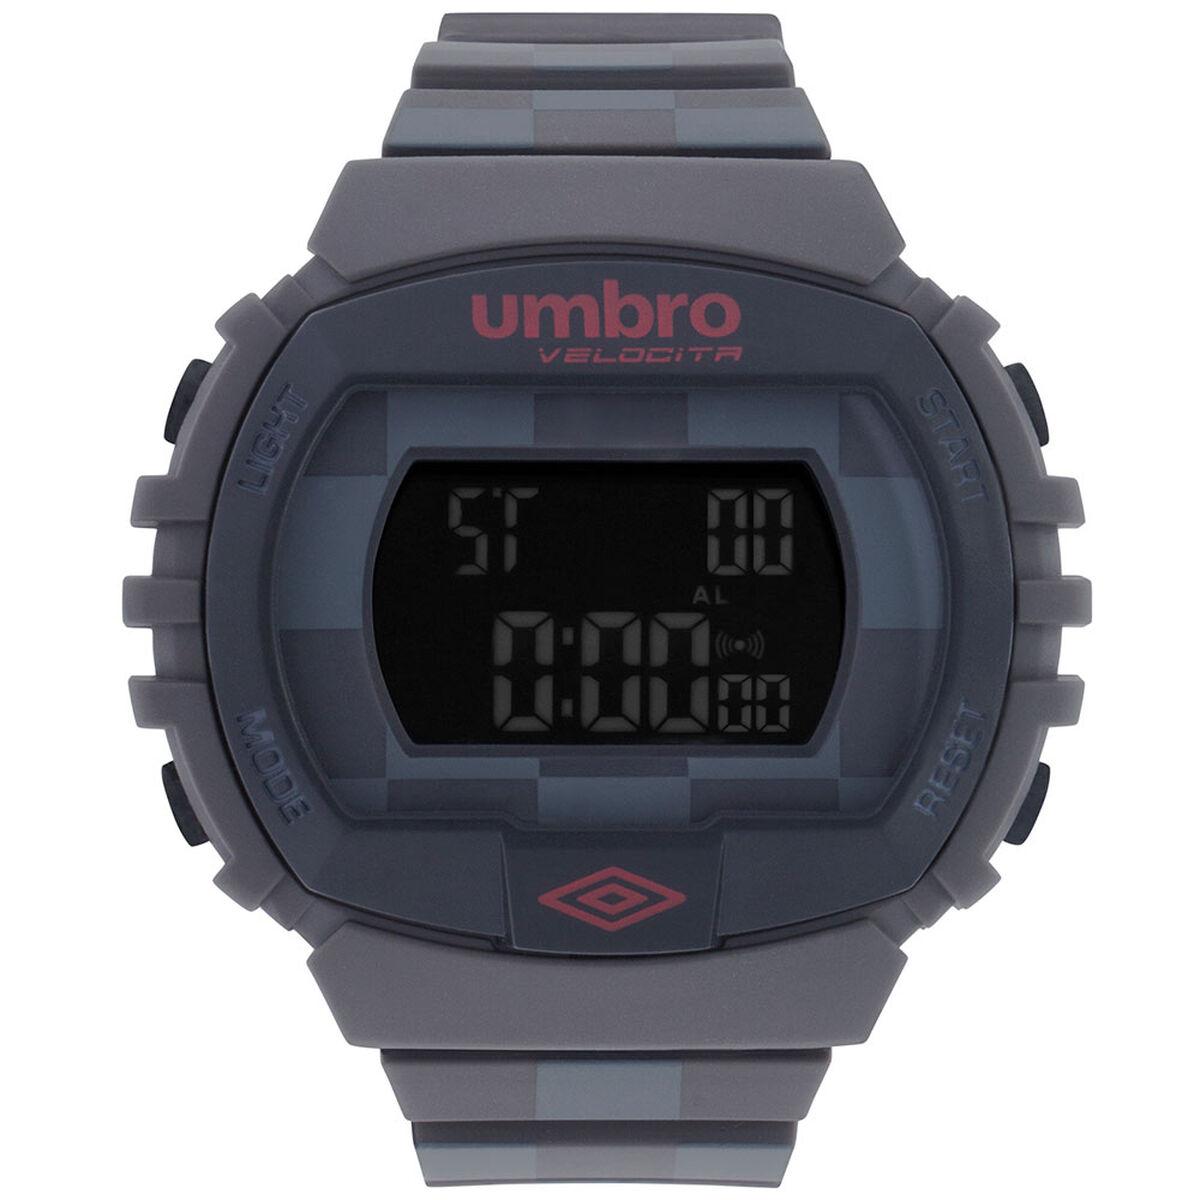 Reloj Digital Umbro UMB-067-1